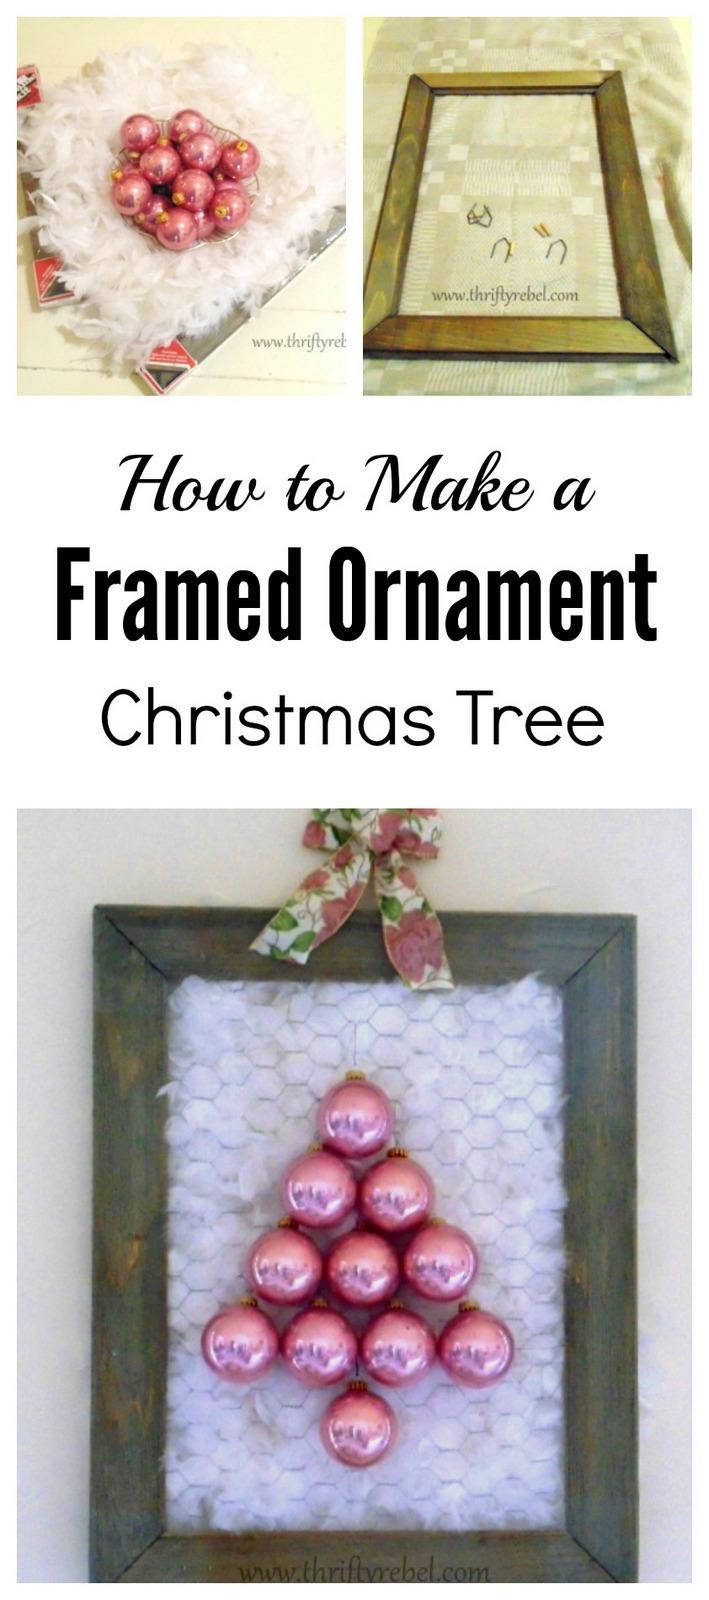 How to make a framed ornament Christmas tree